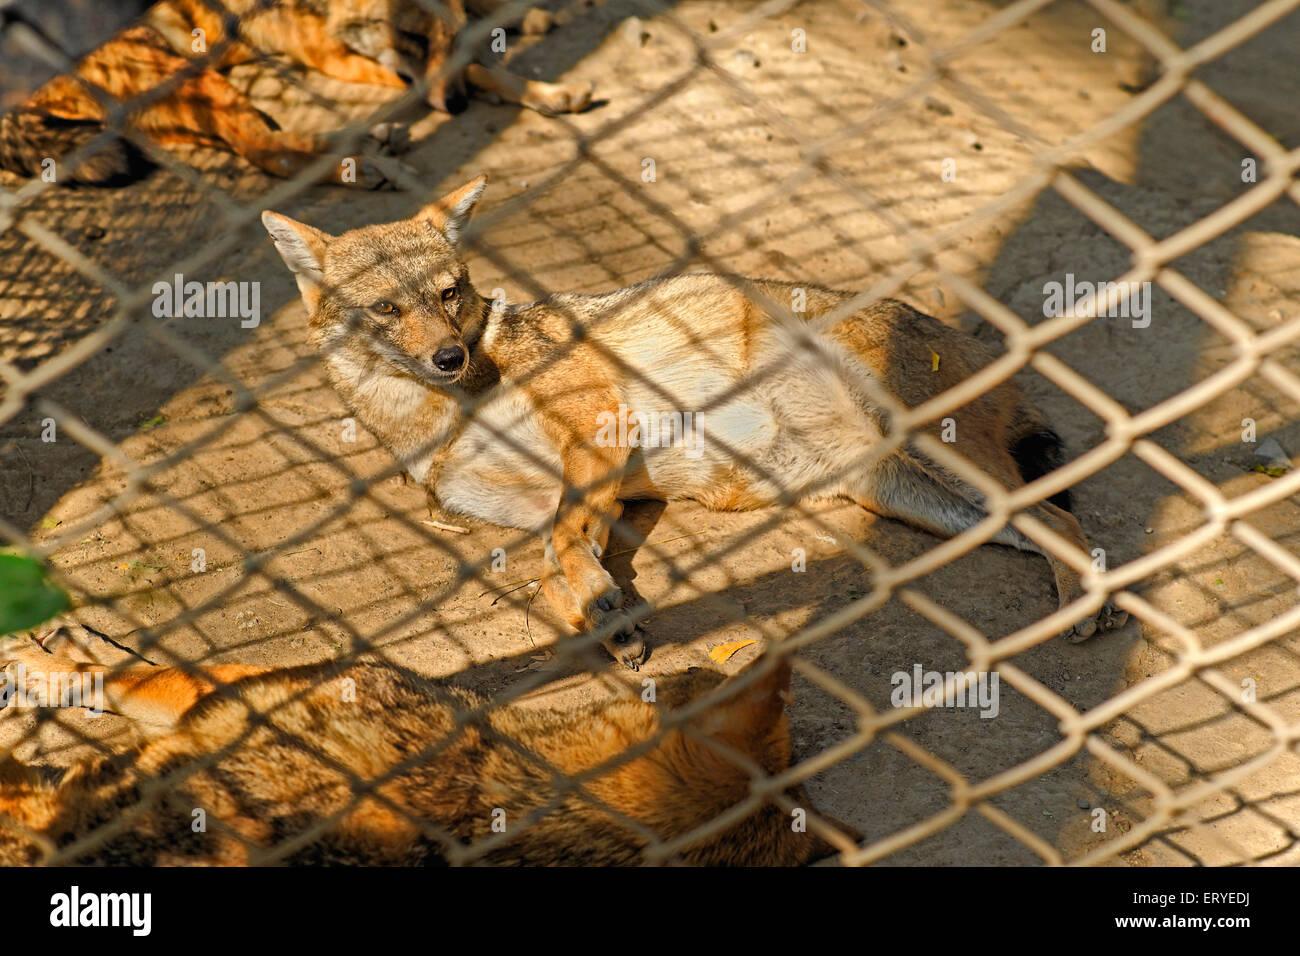 La vie sauvage; golden chacal Canis aureus; Sakkarbag; Junagadh; Gujarat Inde; Banque D'Images